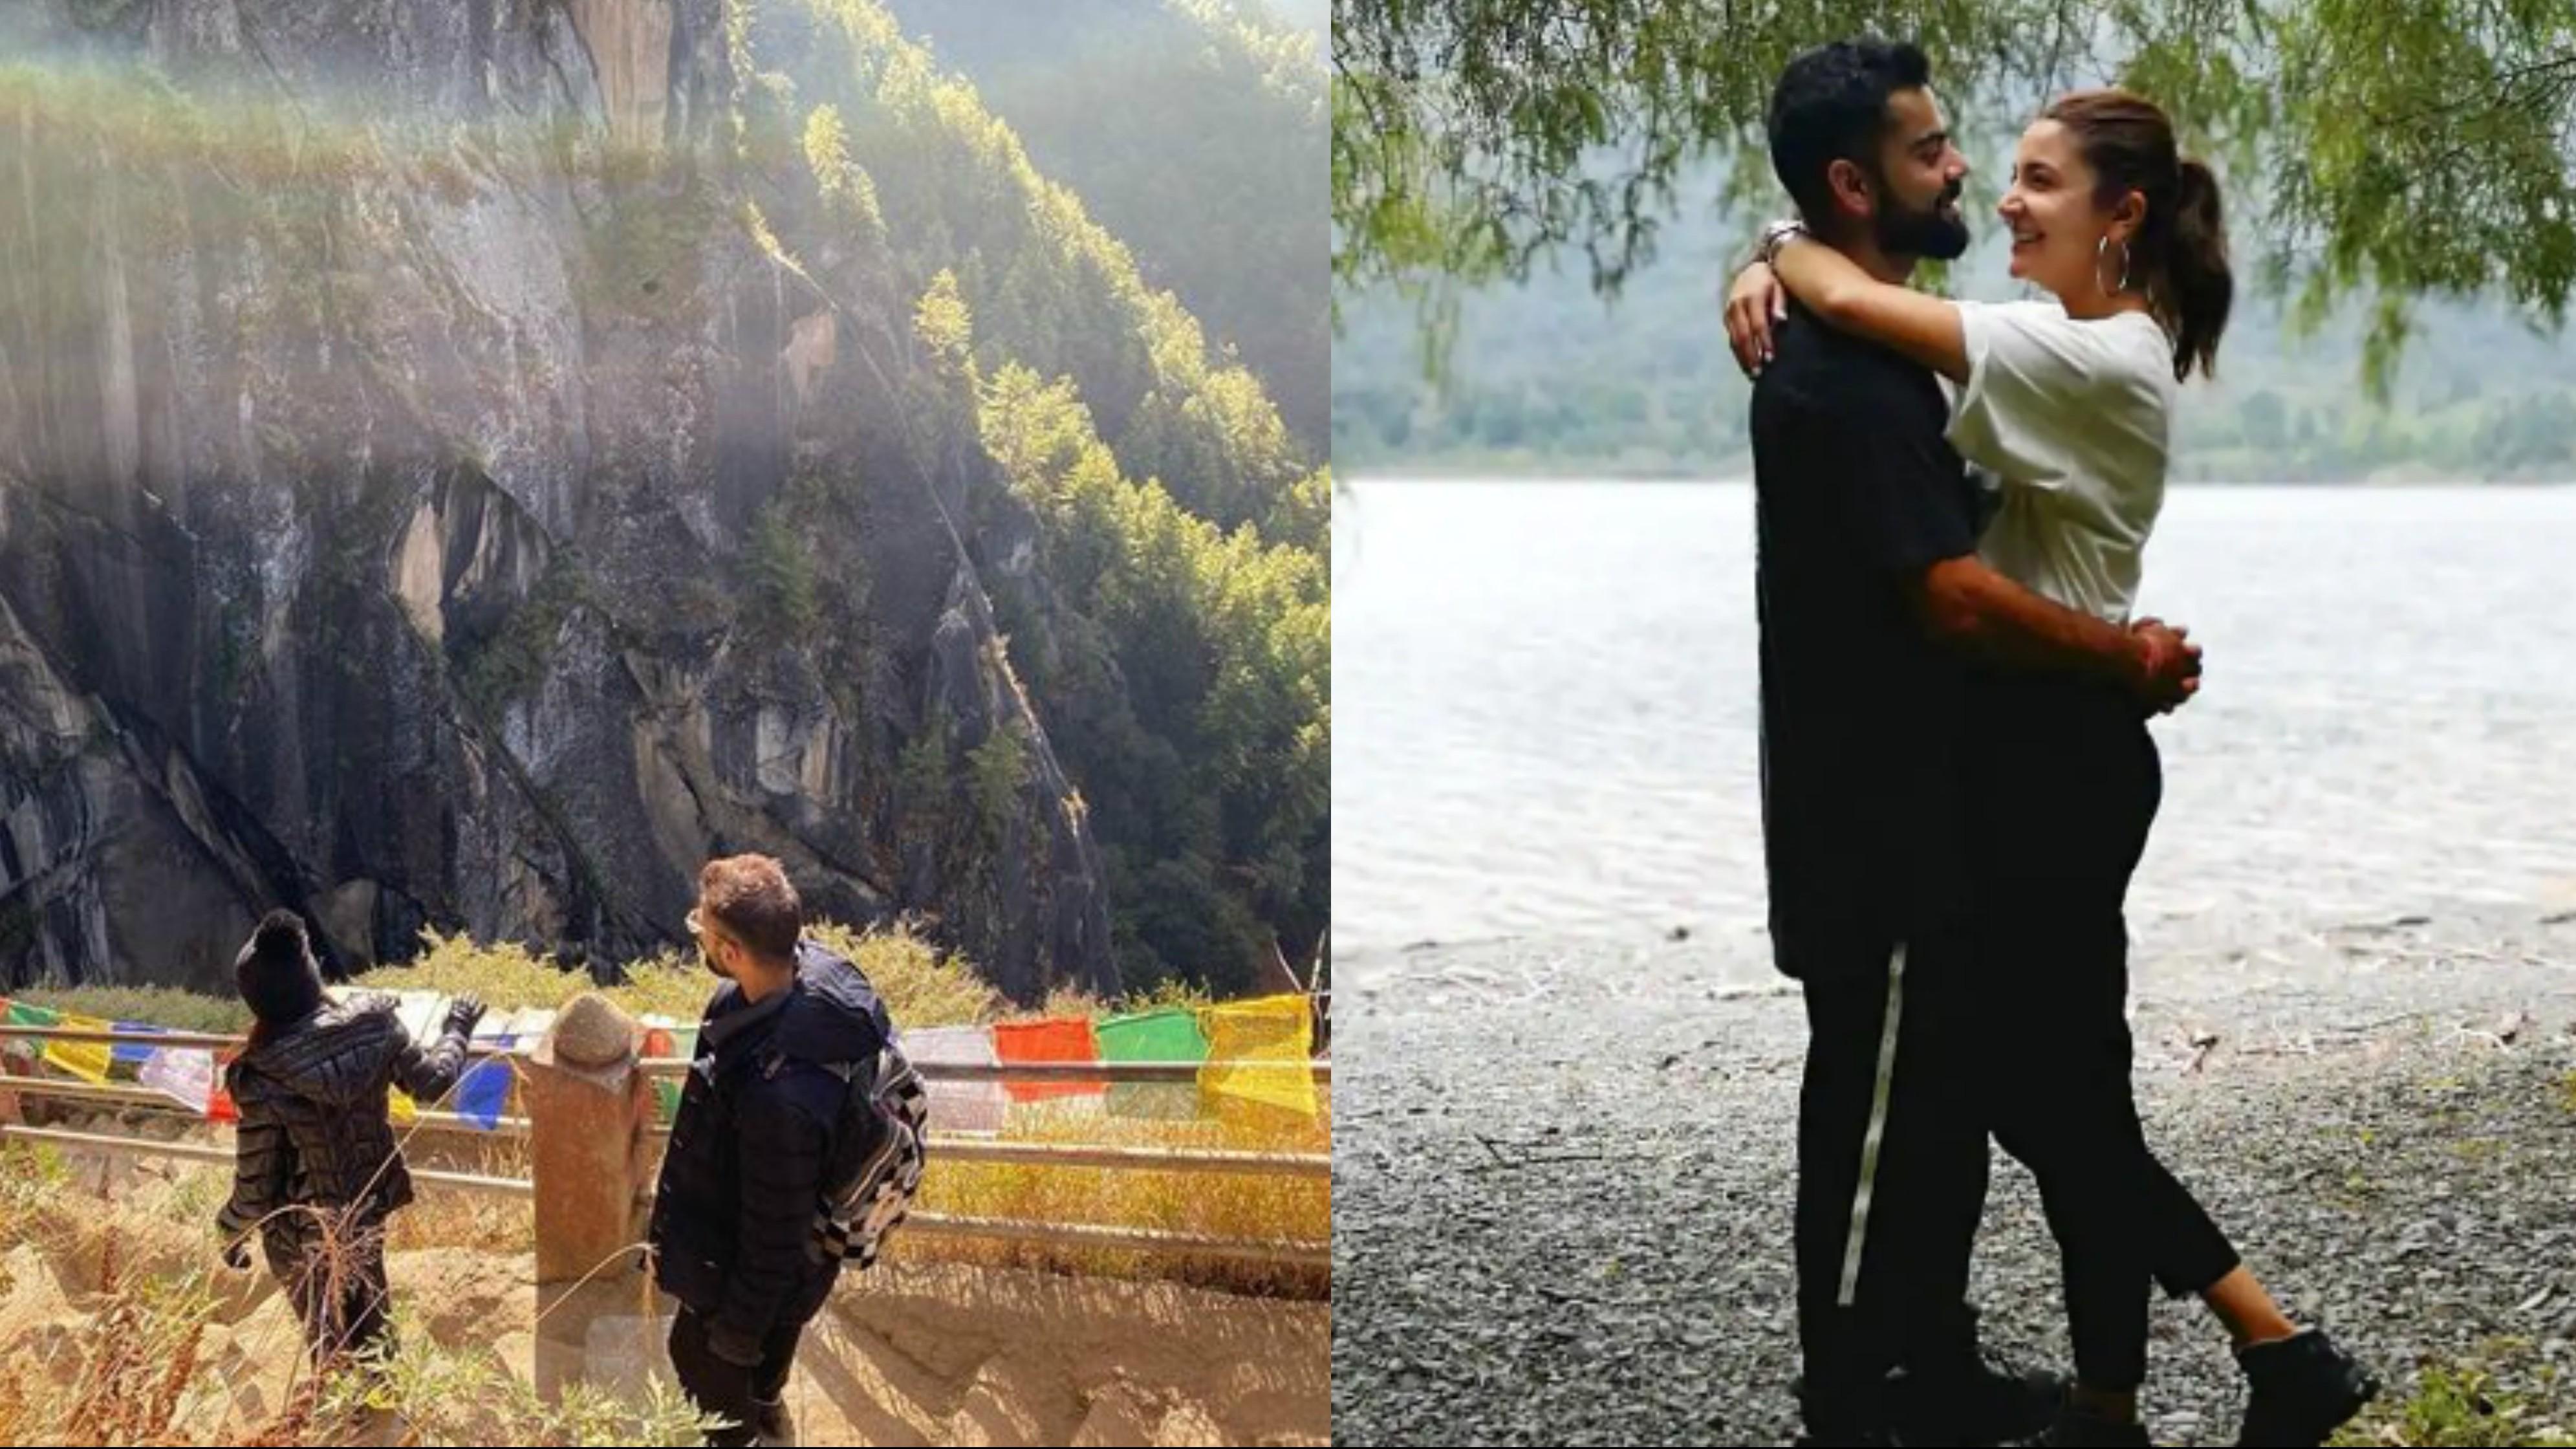 Virat Kohli's 'nothing but love' throwback photo with Anushka Sharma is winning hearts